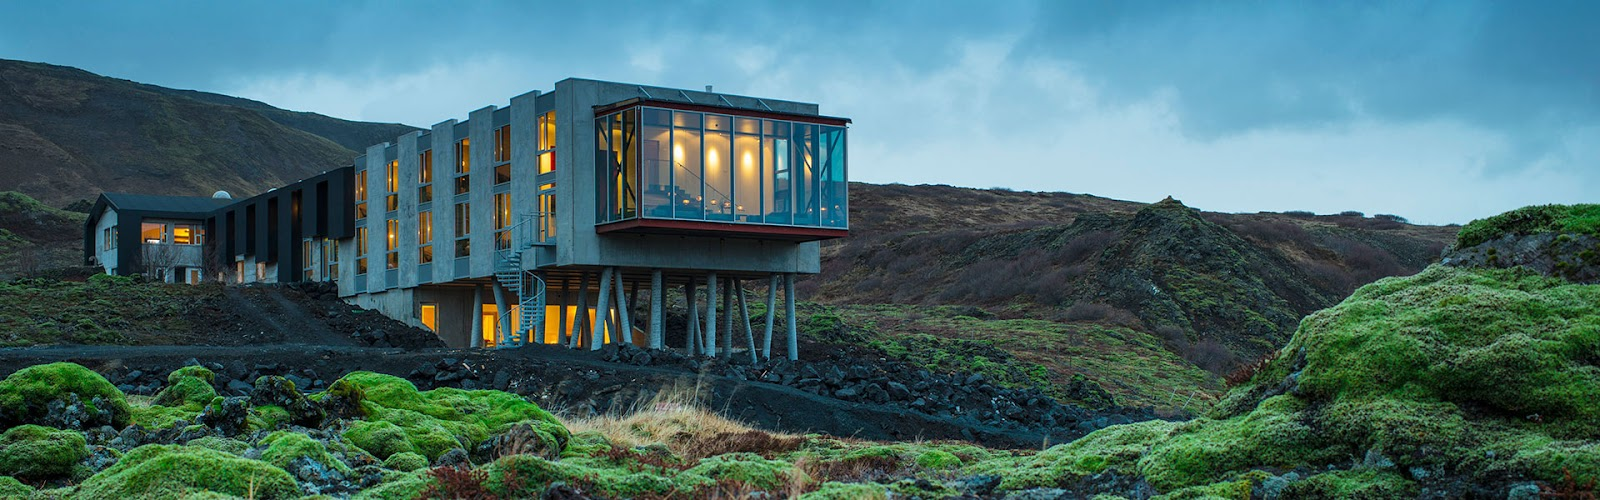 ION Adventure Hotel, Iceland, glass windows